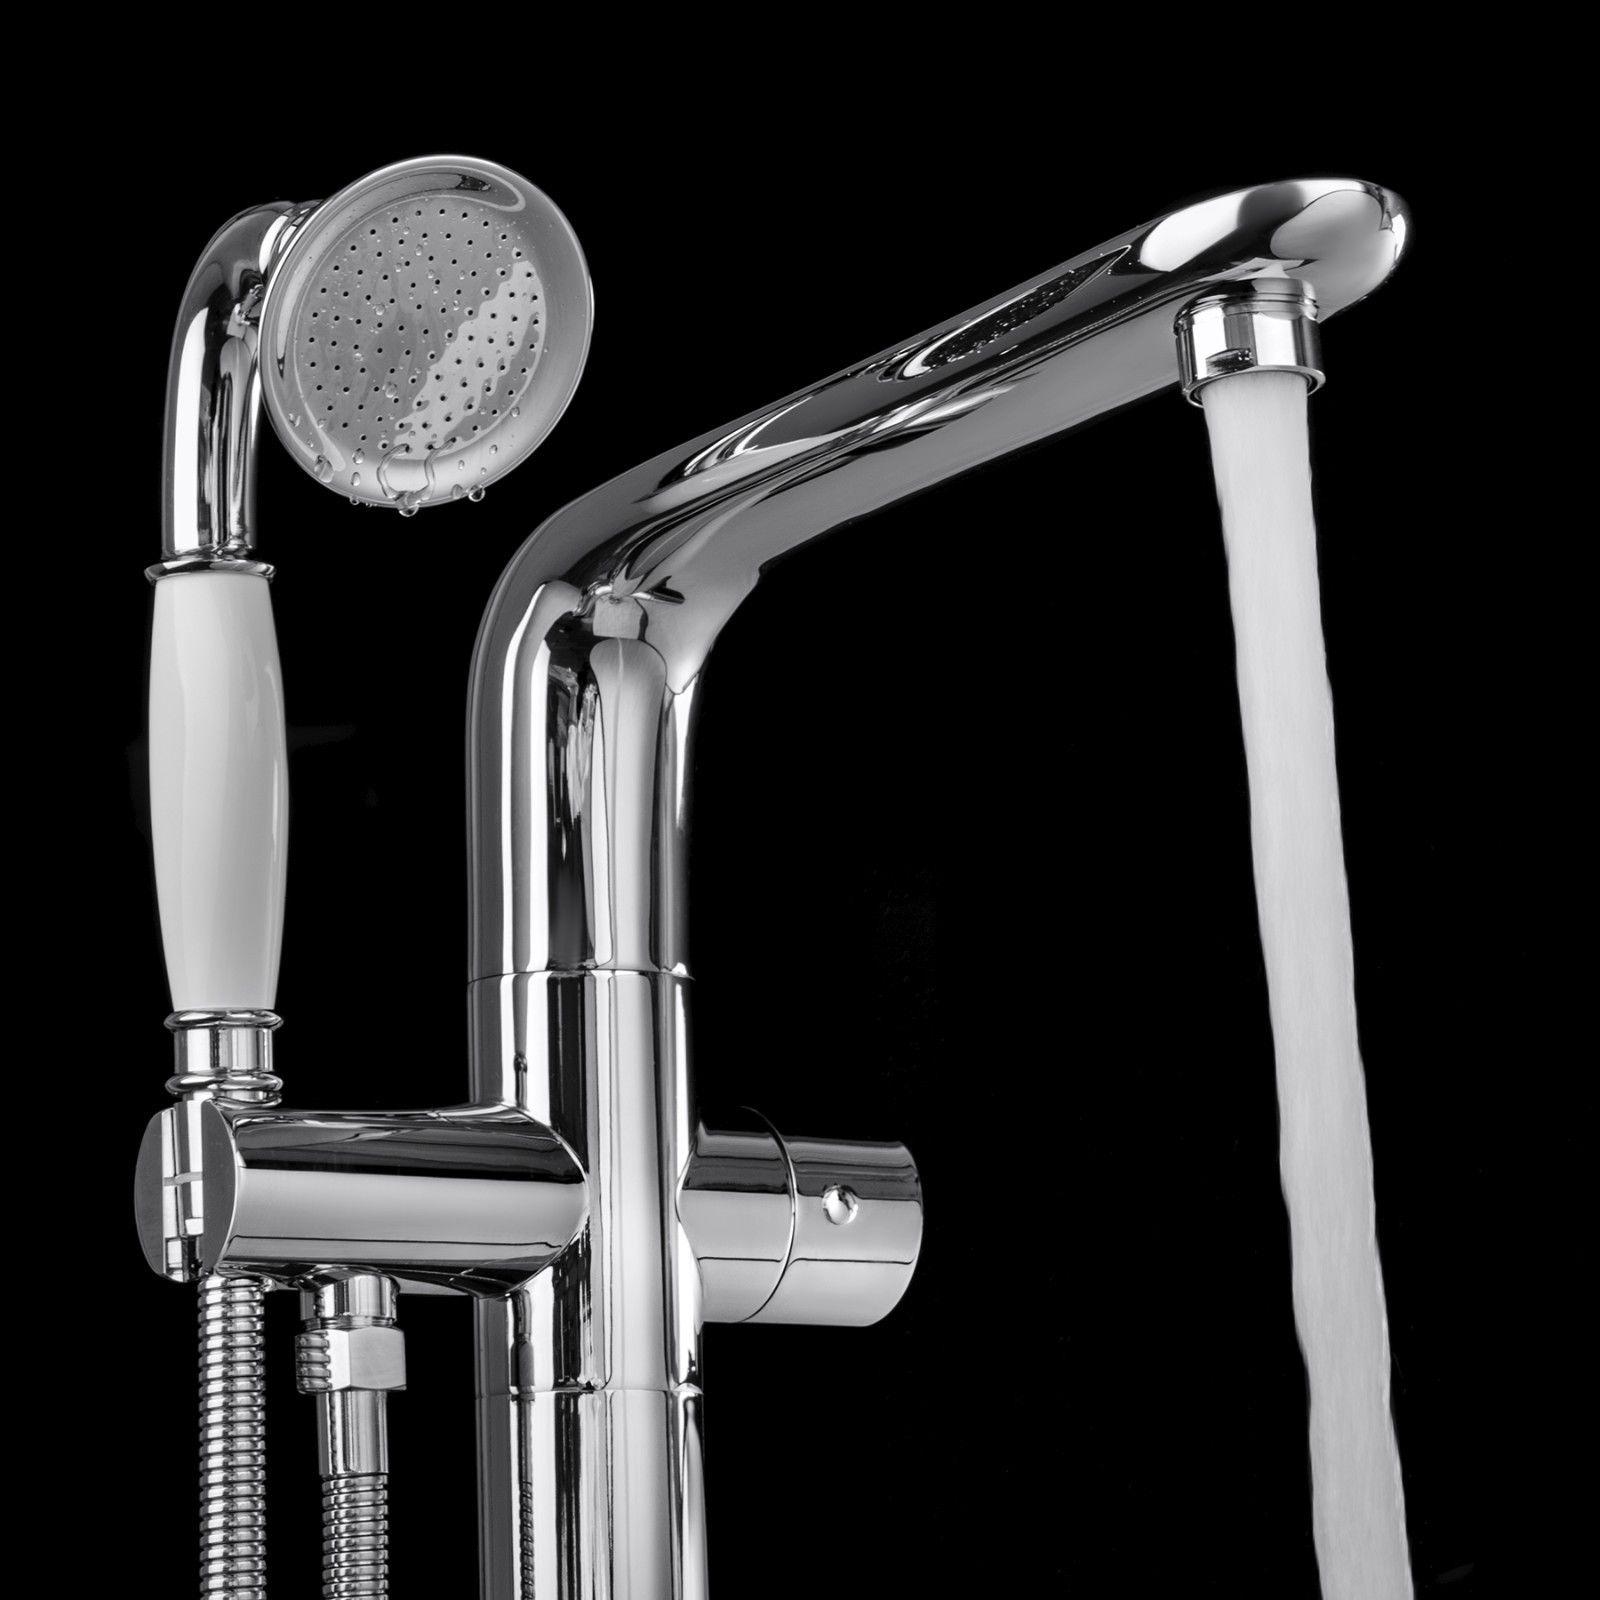 "Medellin 67"" Freestanding Bathtub With Chrome Tub Filler Faucet"